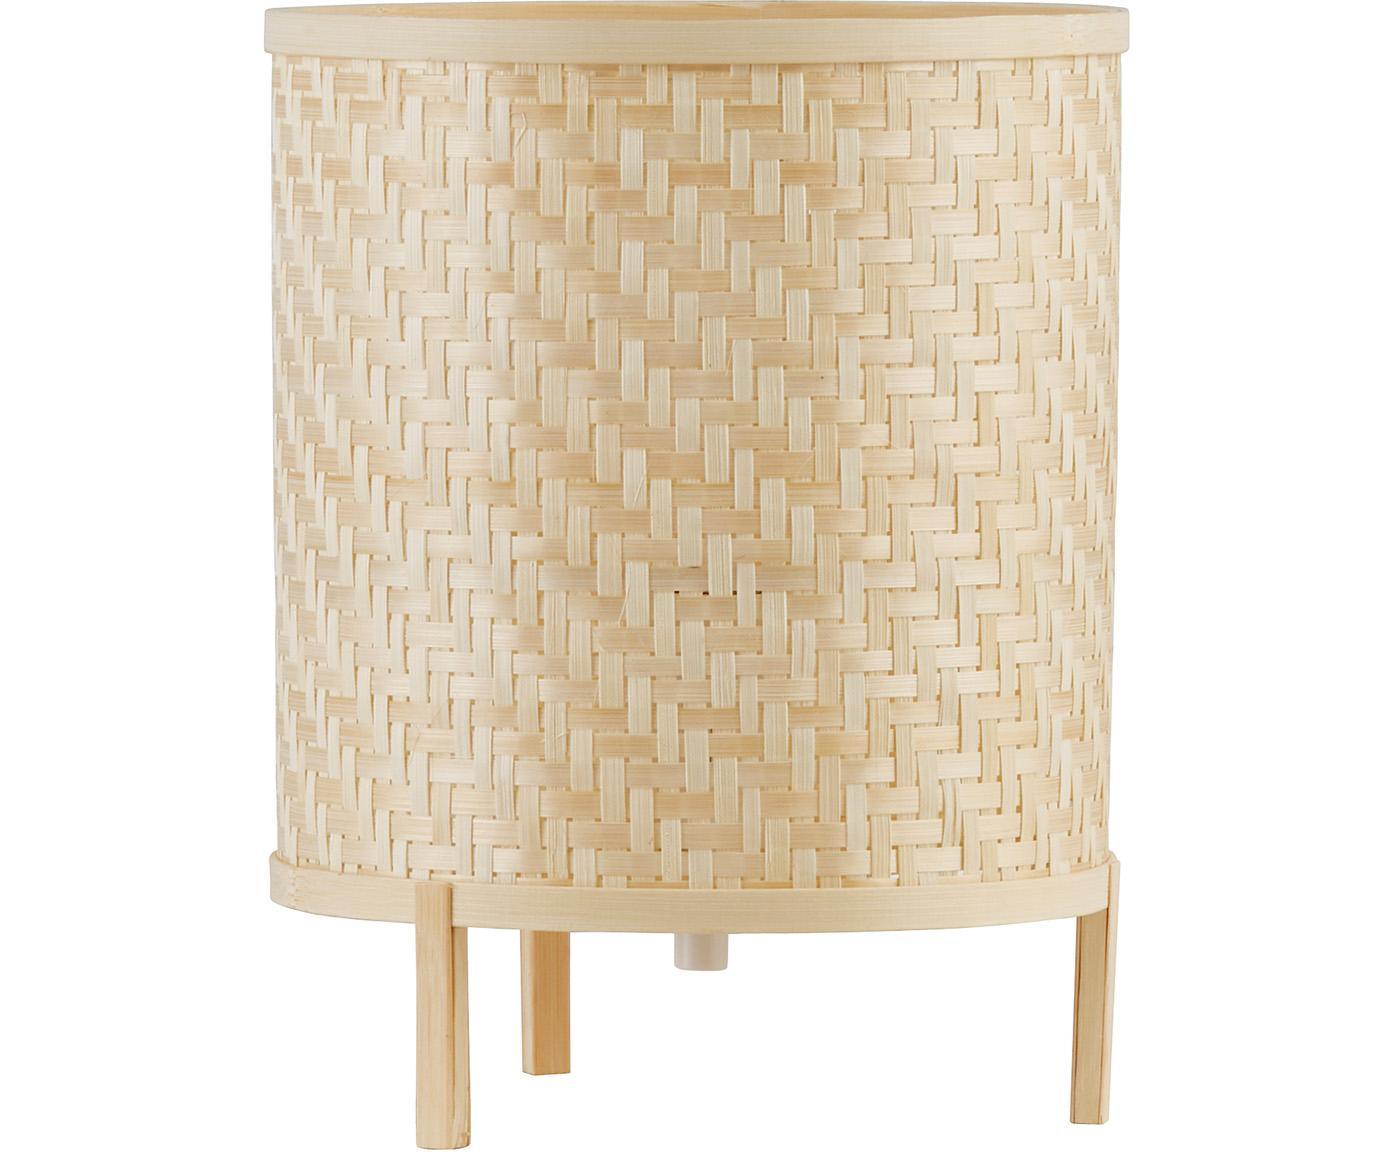 Tafellamp Trinidad van bamboe vlechtwerk, Lampenkap: bamboehouten vlechtwerk, Lampvoet: bamboehout, Bruin, Ø 19 cm